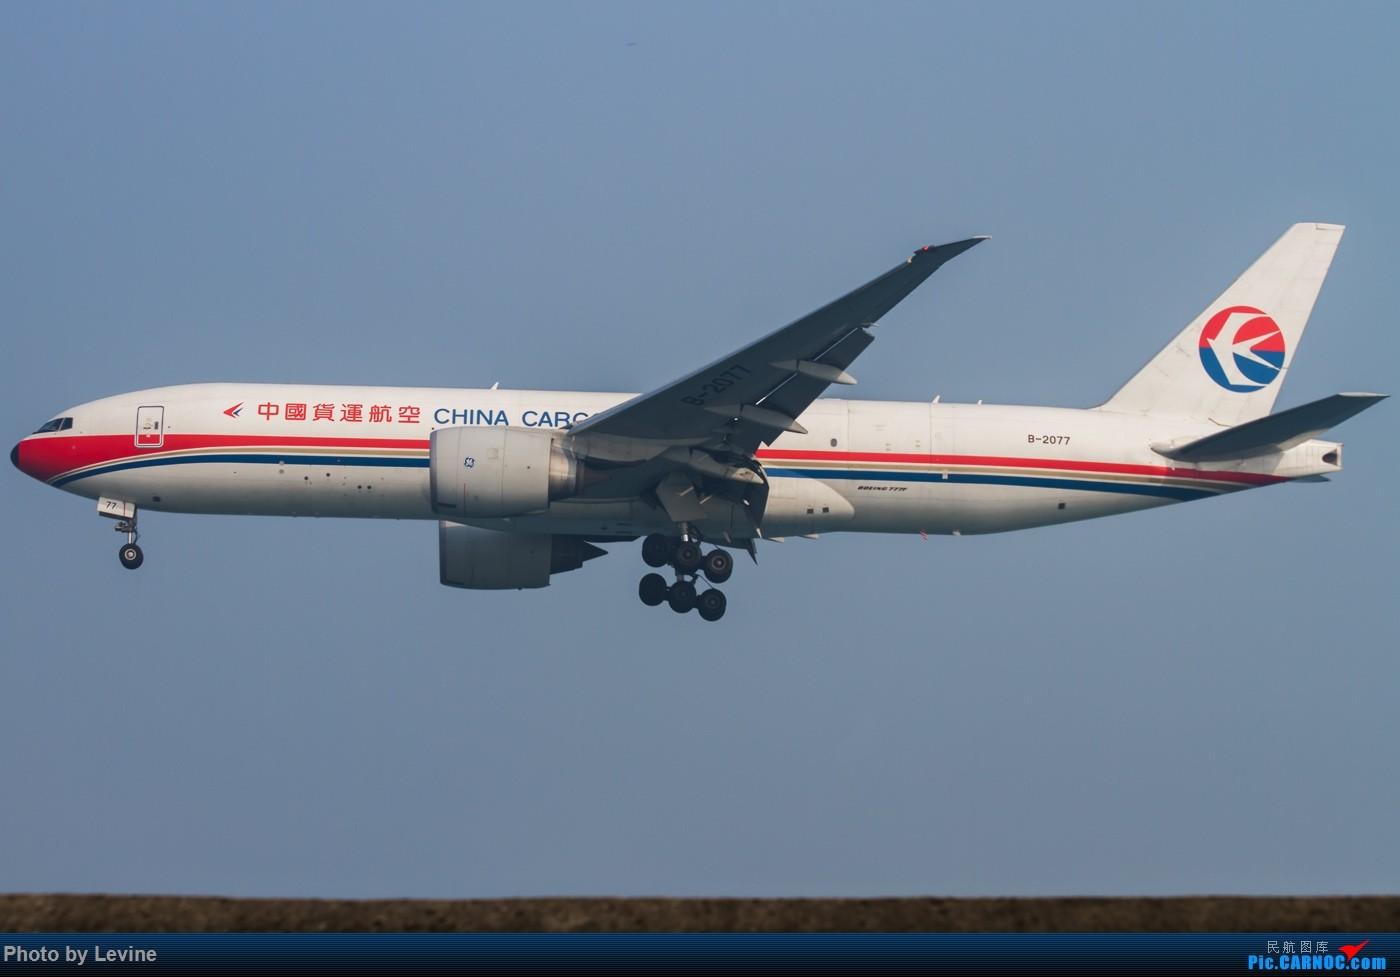 Re:[原创]◇ ■ ◇ ■ ◇ ■难得去一次香港却遇到大烂天◇ ■ ◇ ■ ◇ ■ BOEING 777-200 B-2077 中国香港赤鱲角国际机场